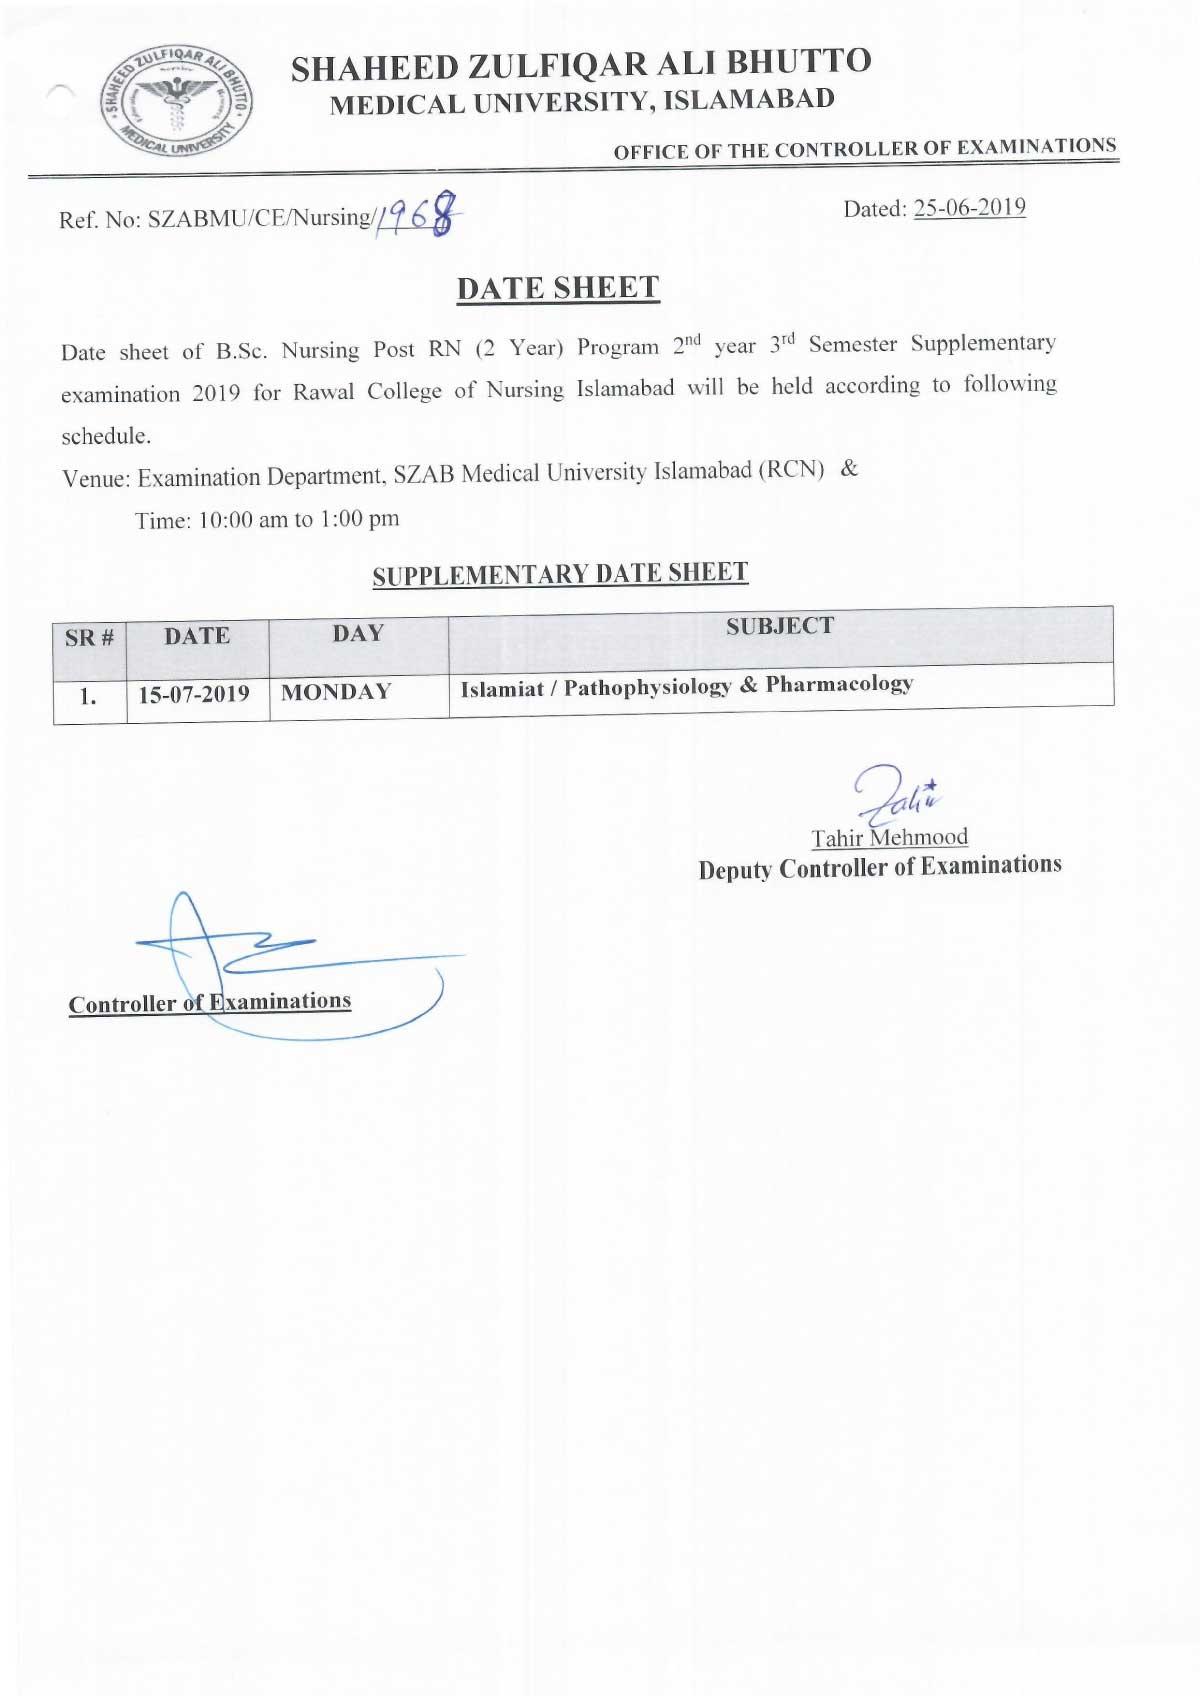 Date sheet of B.Sc Nursing 2nd year 3rd Semester annual examination 2019